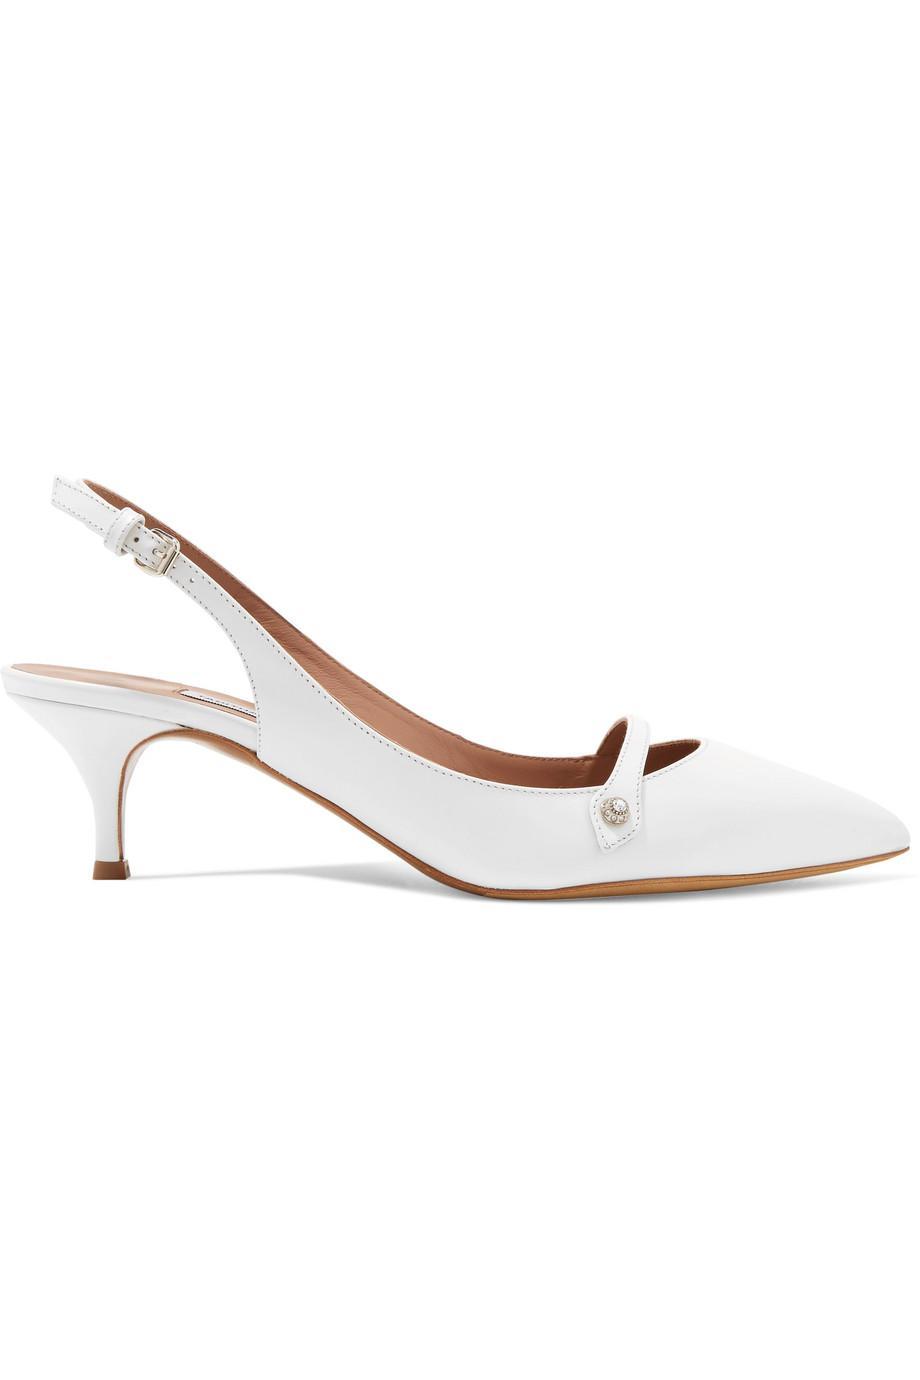 Layton Crystal-embellished Leather Slingback Pumps - White Tabitha Simmons 2uHhnqd